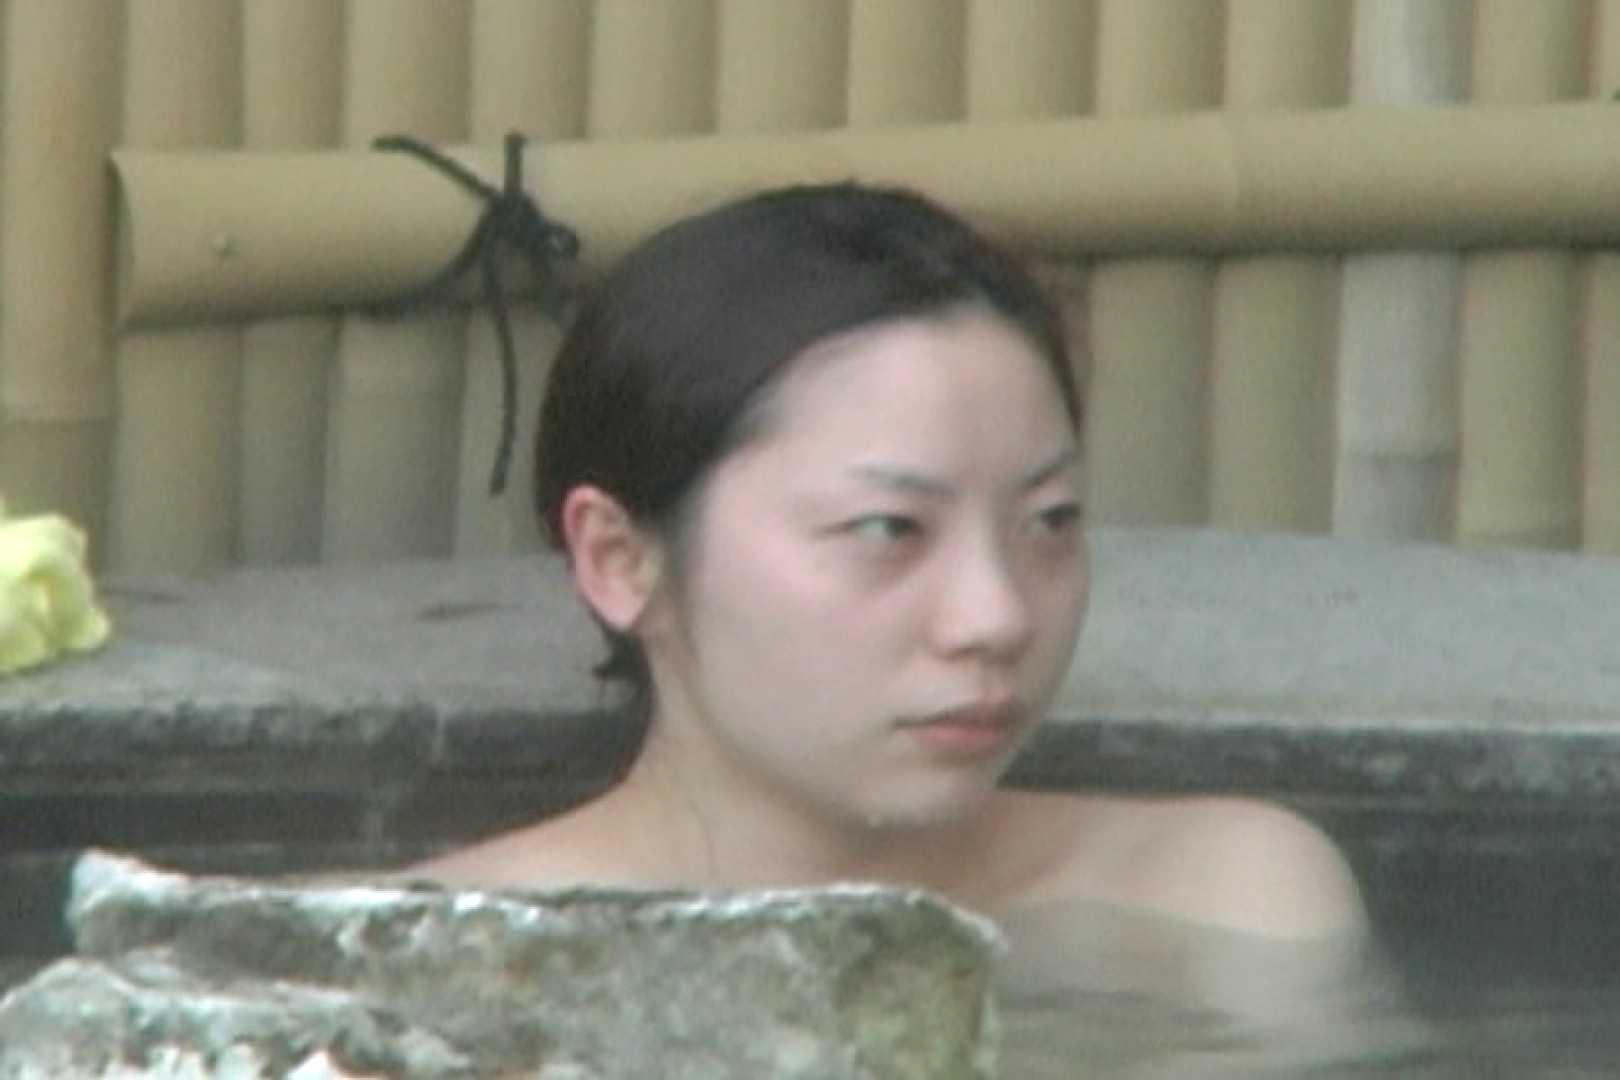 Aquaな露天風呂Vol.596 露天 覗きおまんこ画像 77画像 71